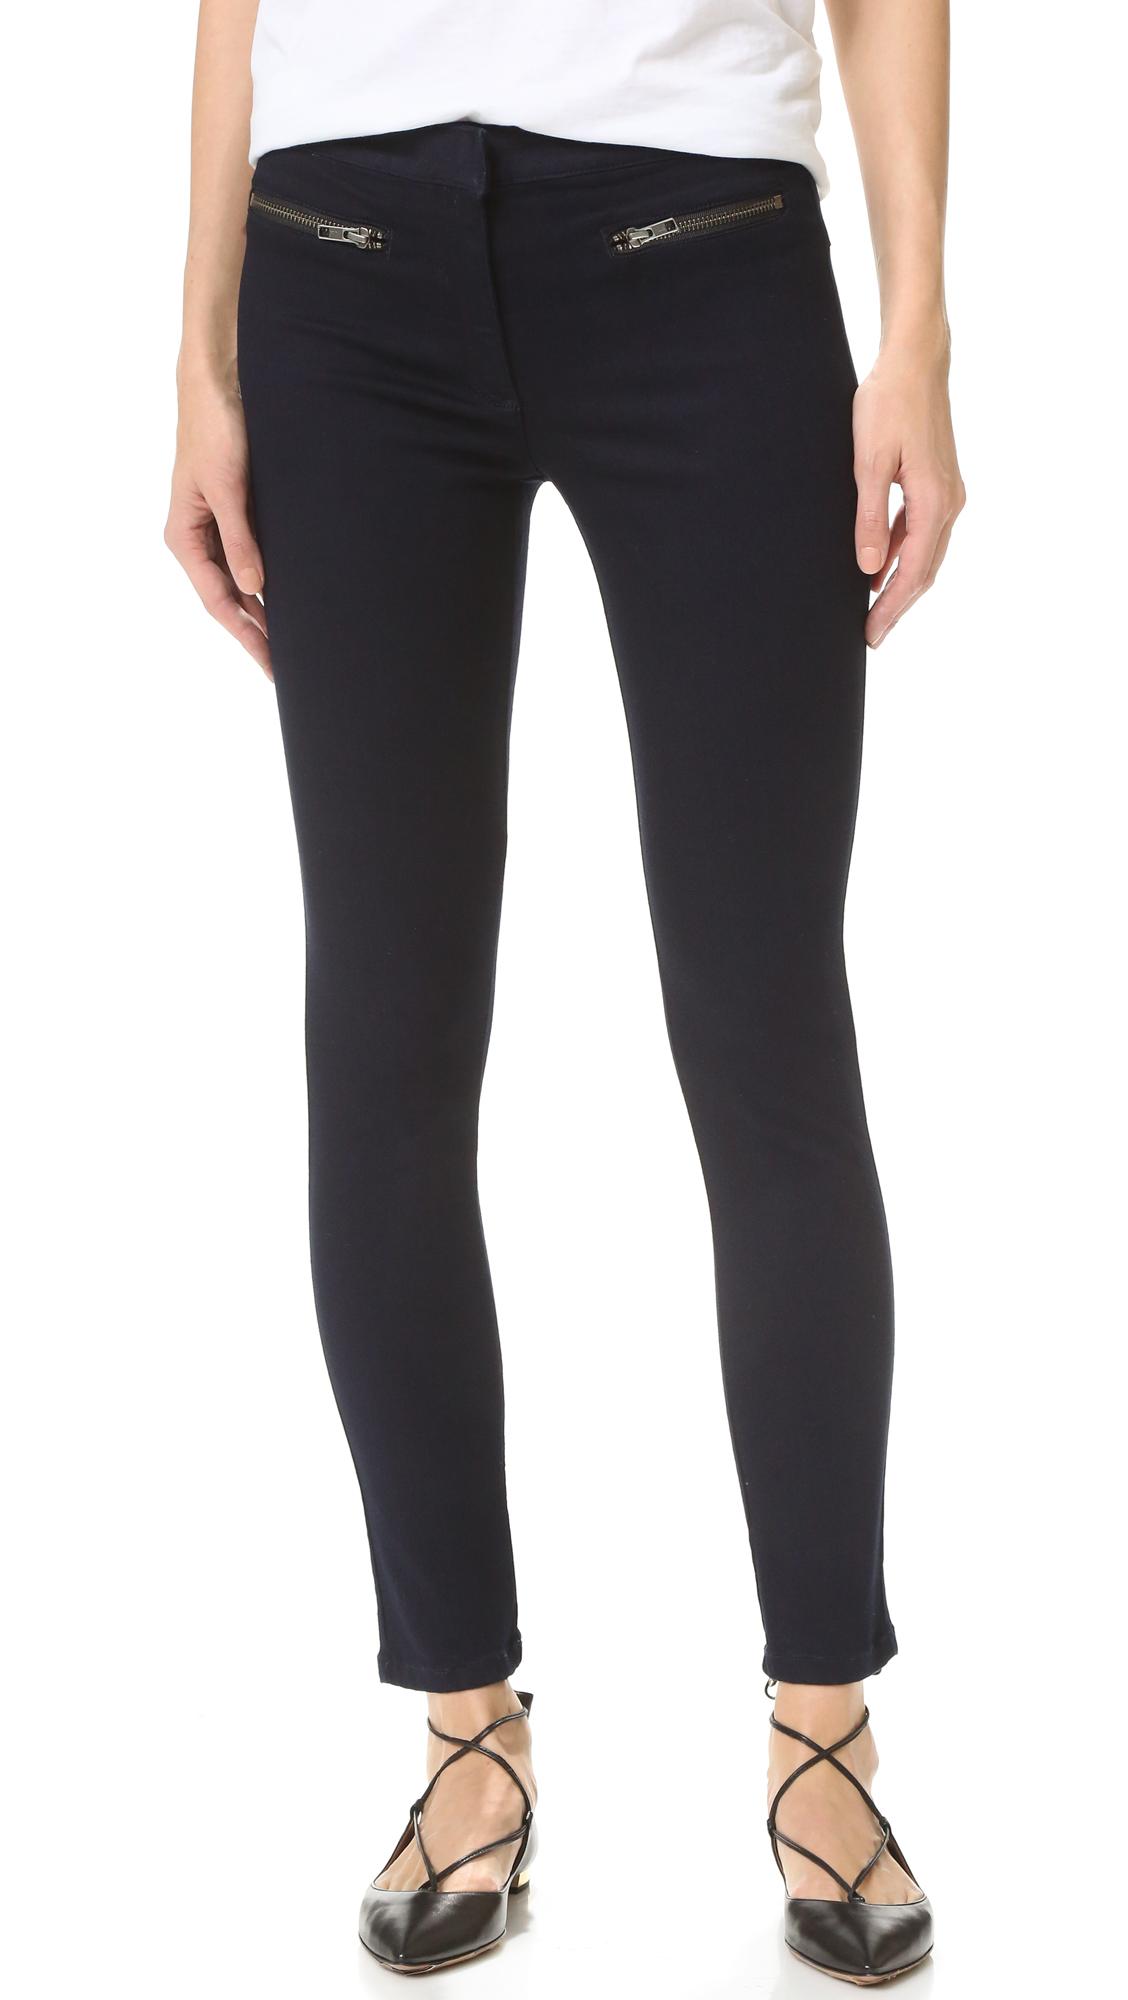 Veronica Beard Skinny Zip Cropped Jeans - Indigo